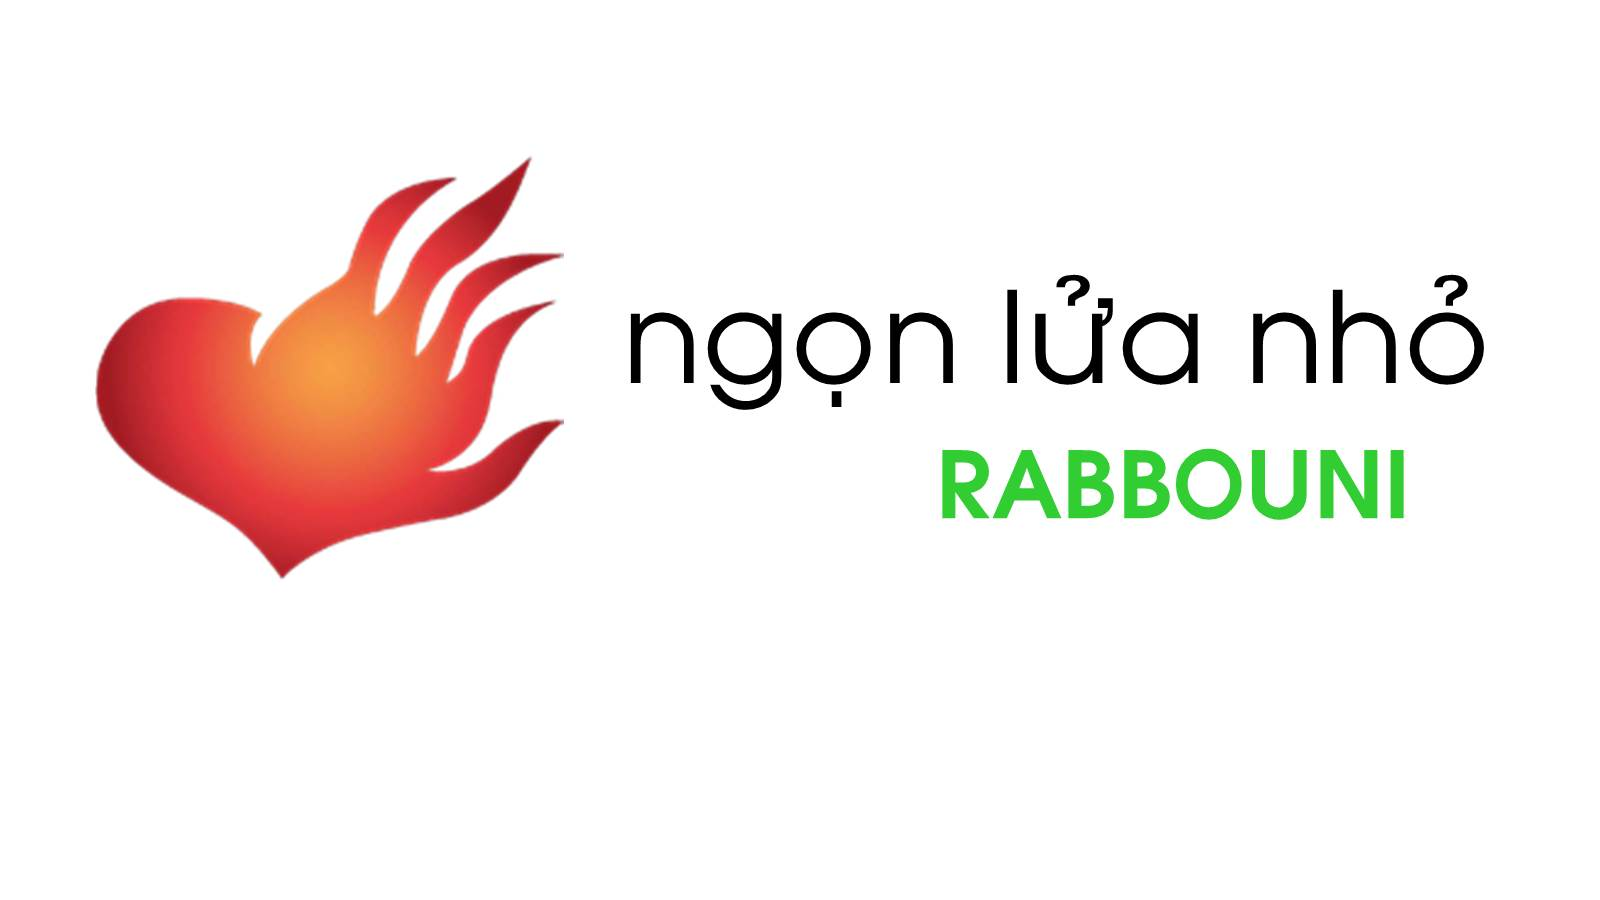 Rabbouni